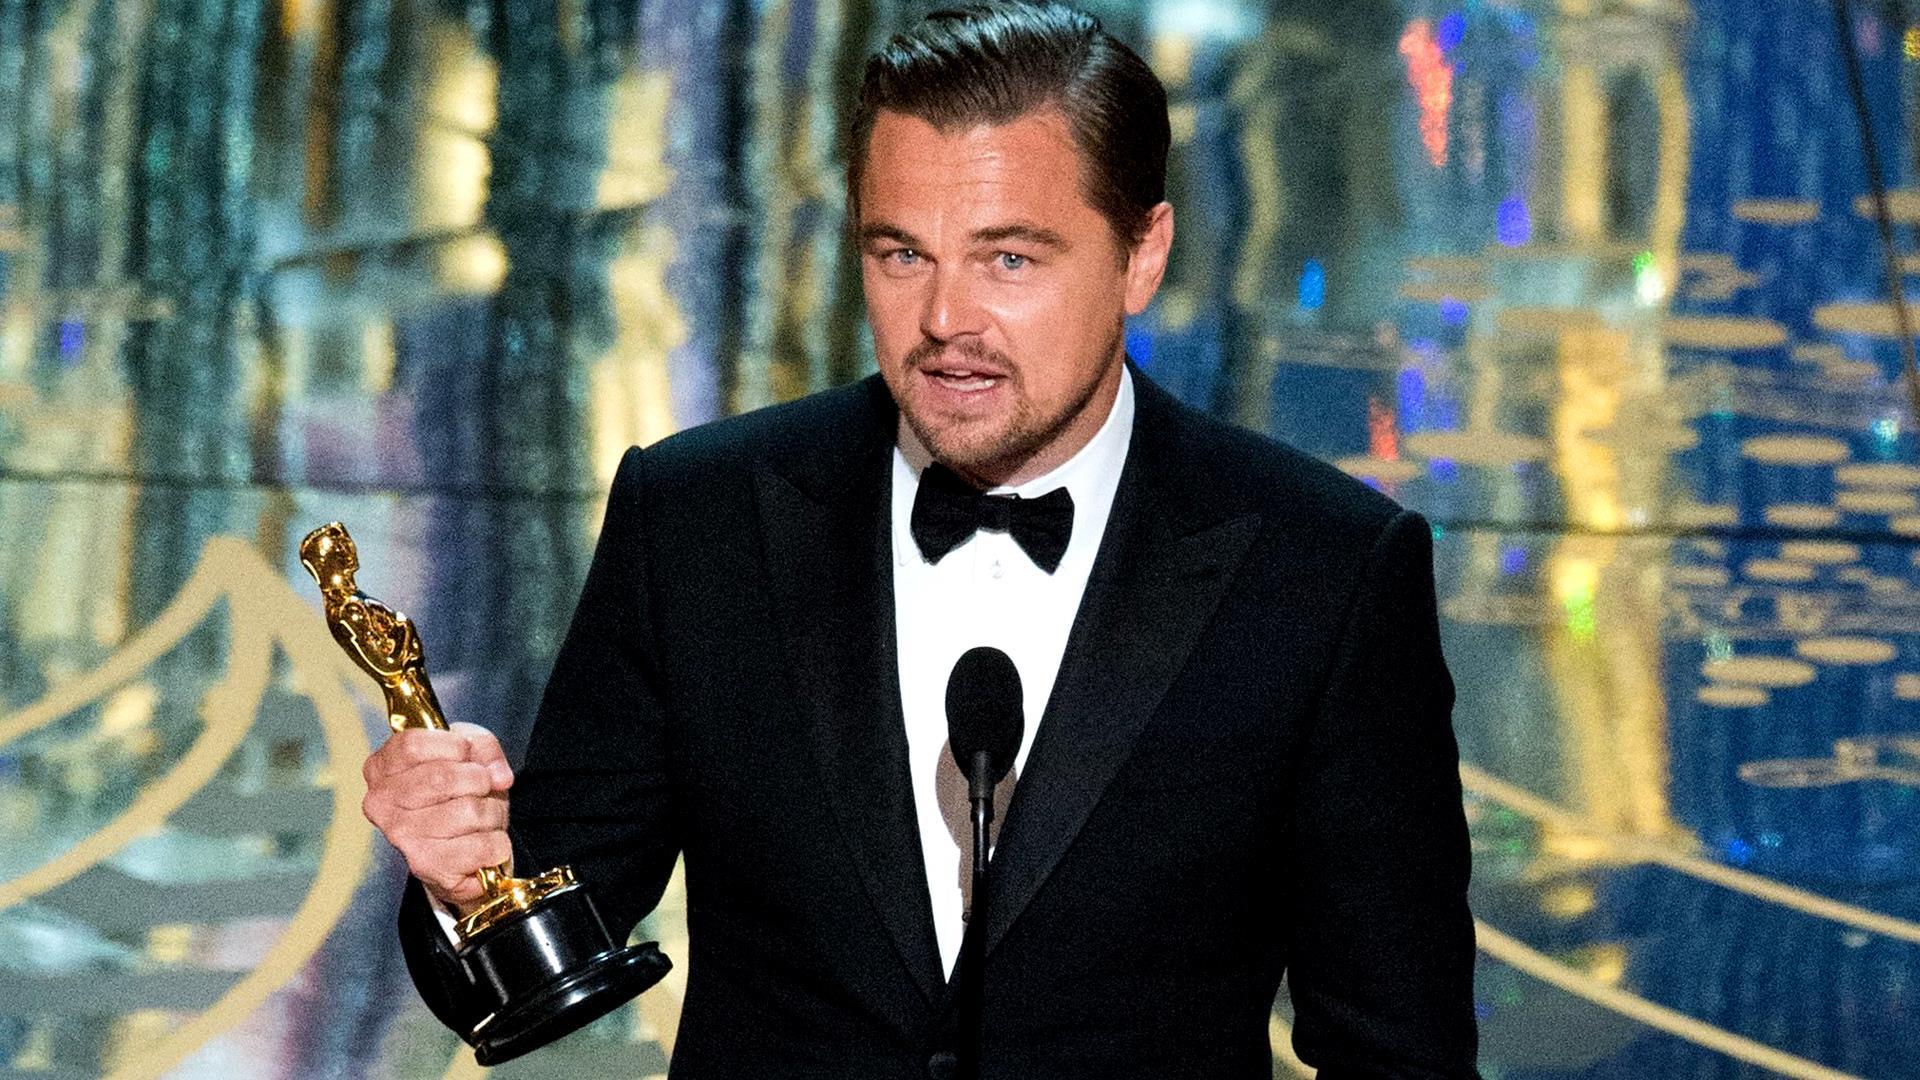 Oscar Backgrounds on Wallpapers Vista